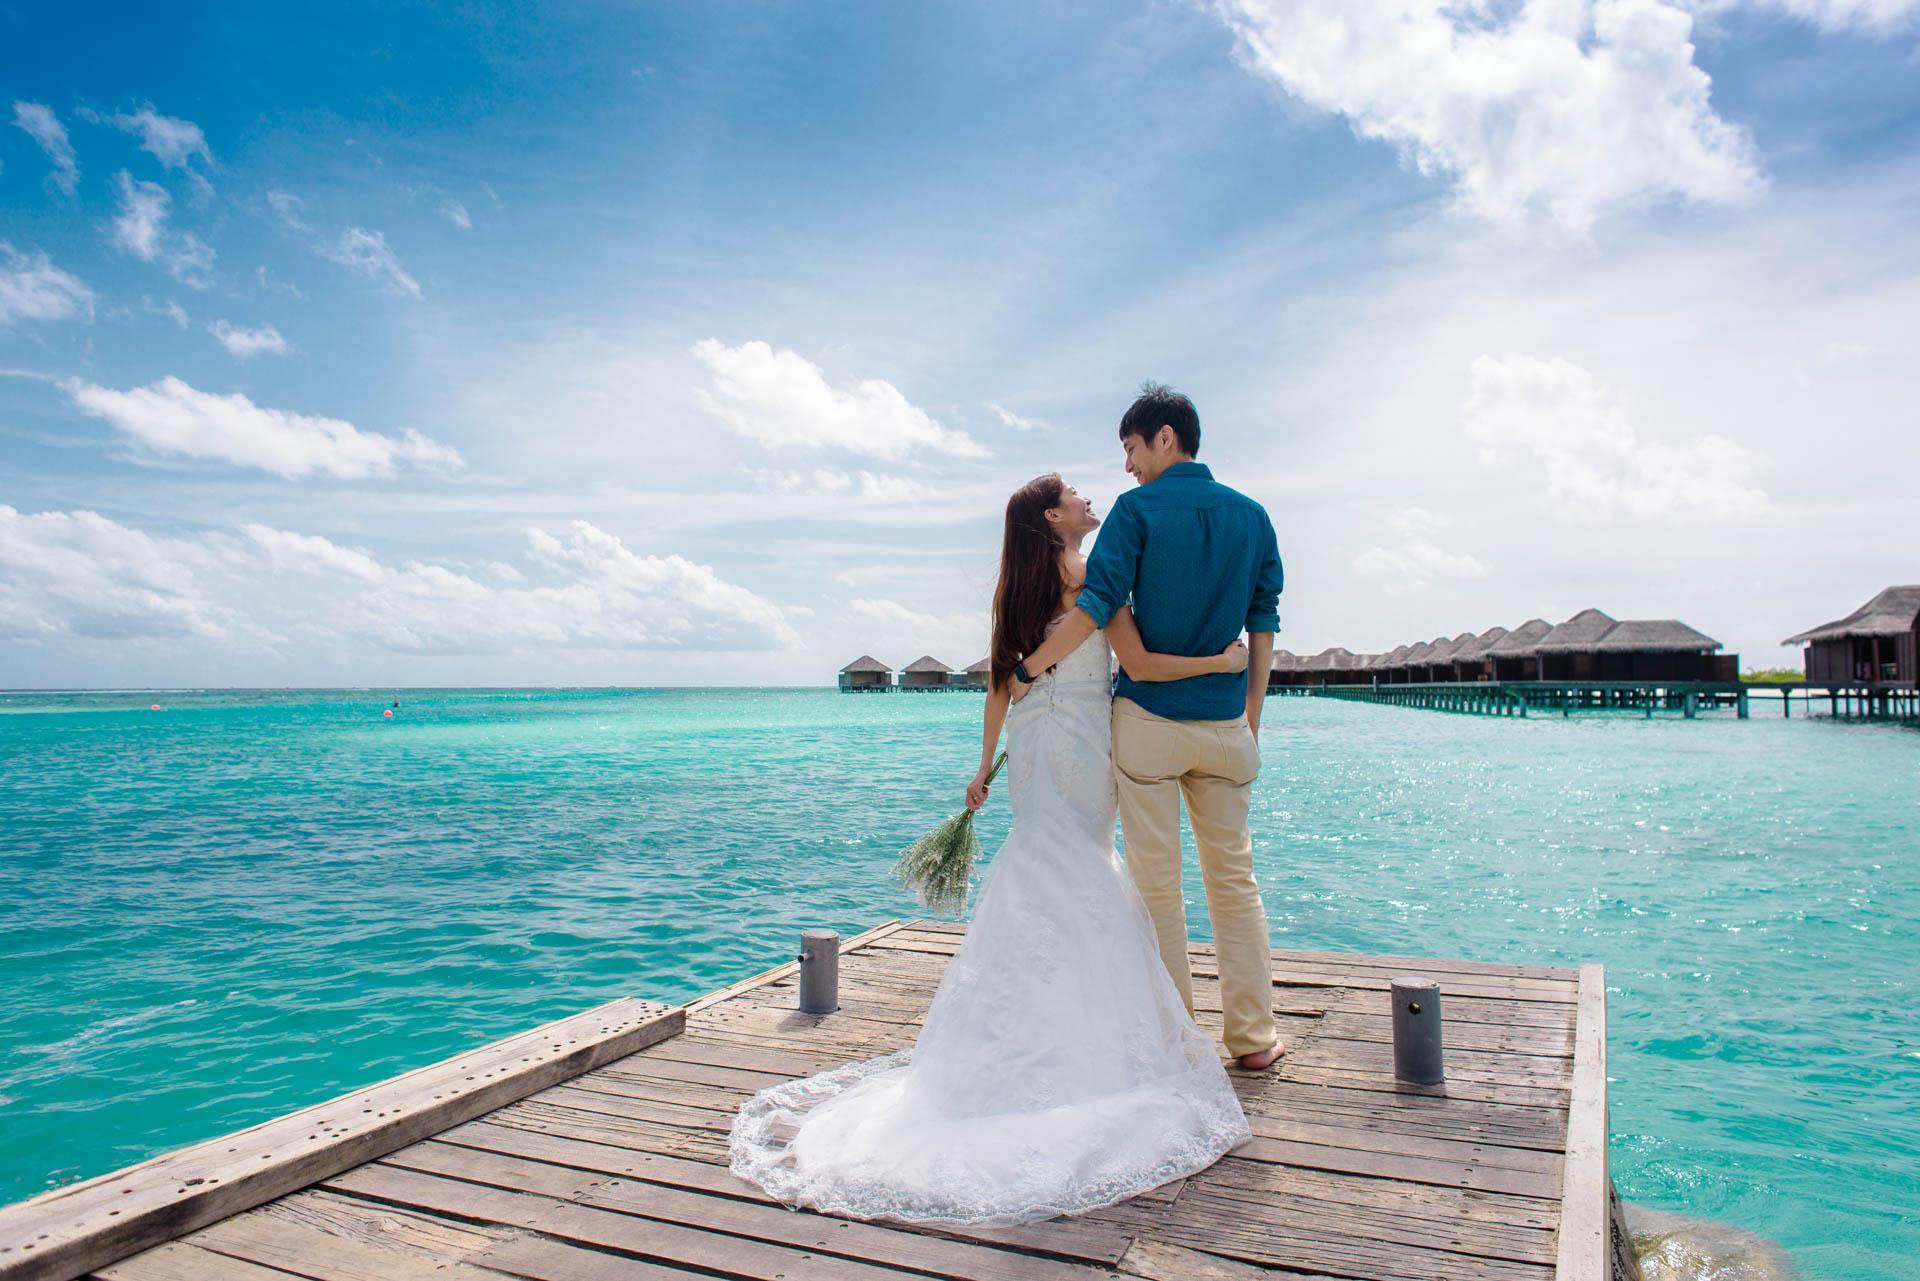 Charmy and Samson Honeymoon Photoshoot at Anantara Dhigu Veli and Naladhu Resort in Maldives by Asads Photography 3